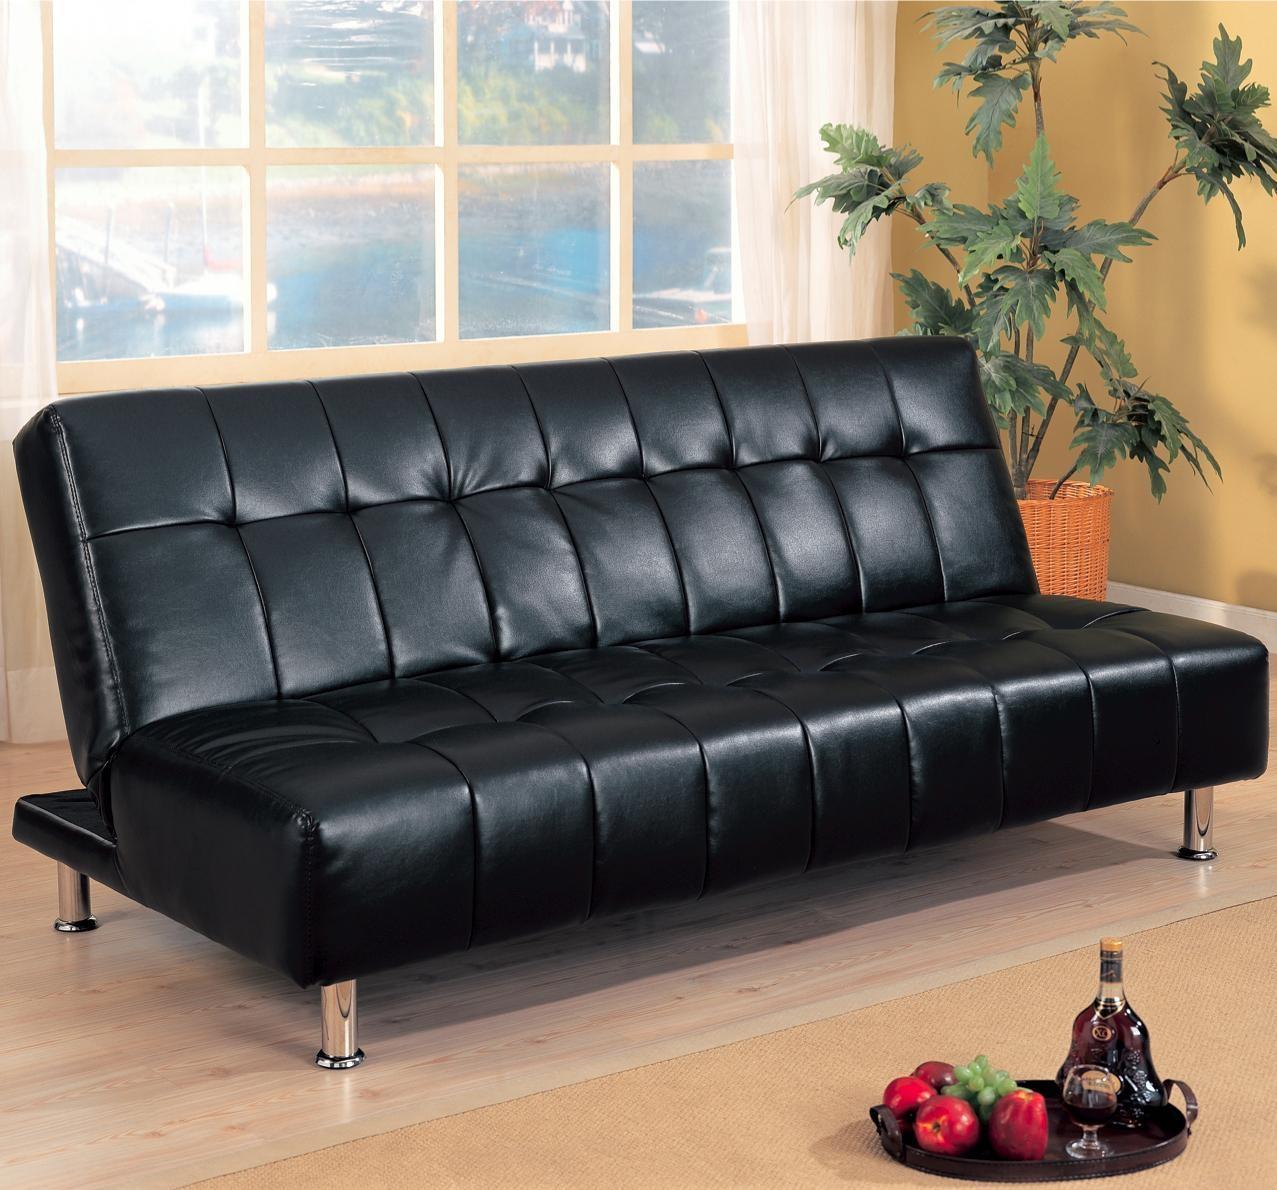 Convertible Sofa Futon | Tehranmix Decoration With Black Leather Convertible Sofas (View 6 of 20)